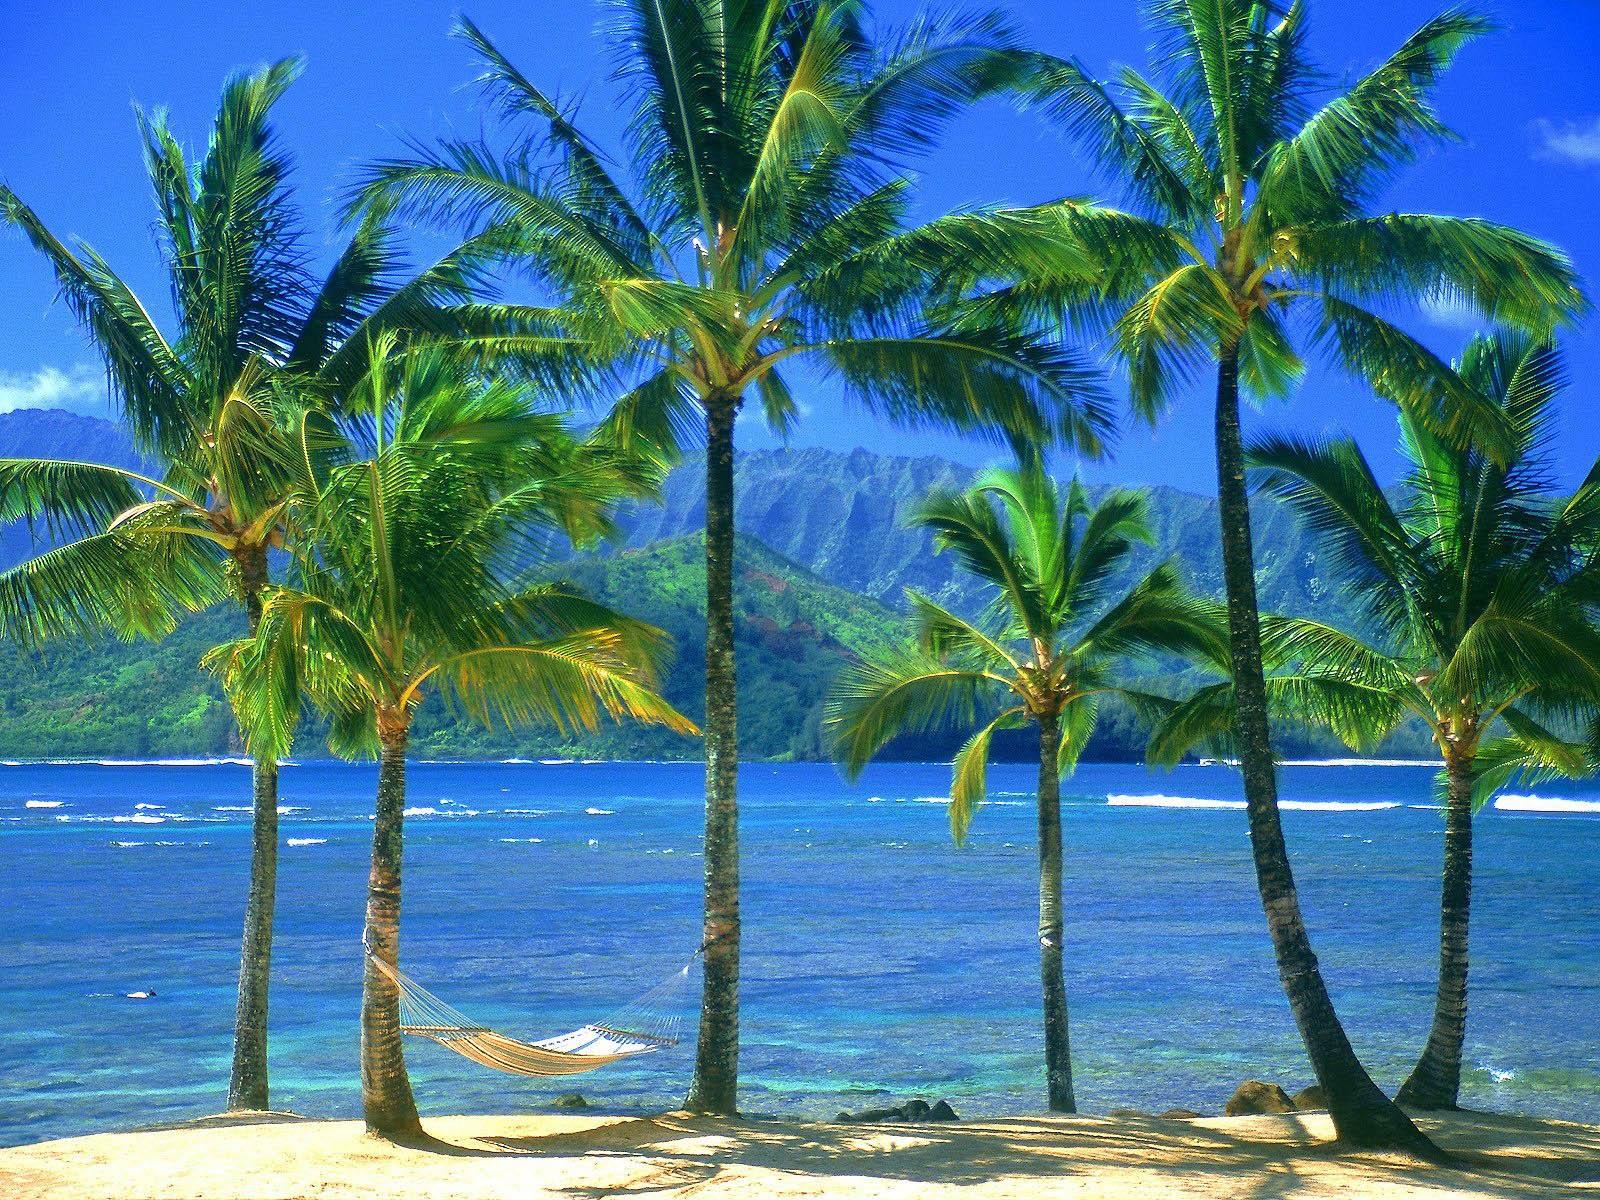 Coconut Tree Wallpapers CoconutTree Desktop Wallpapers Coconut Tree 1600x1200